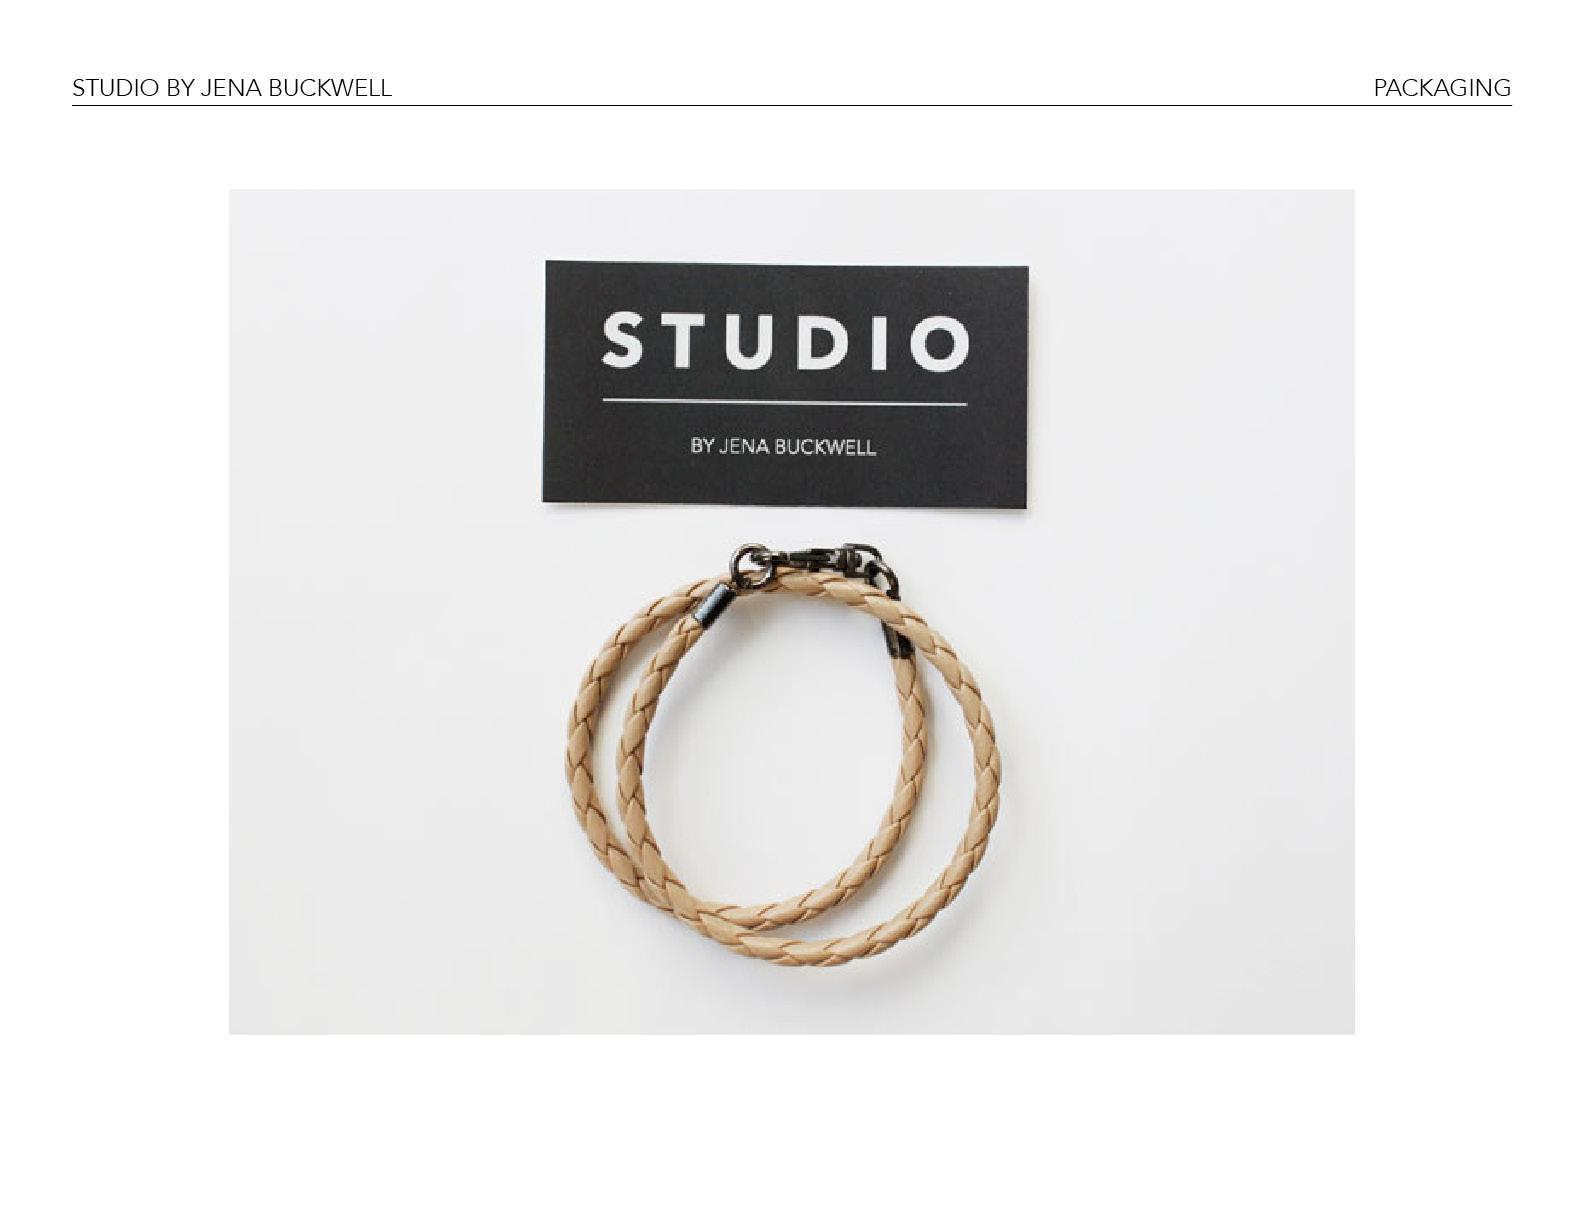 Studio, by Jena Buckwell - image 11 - student project